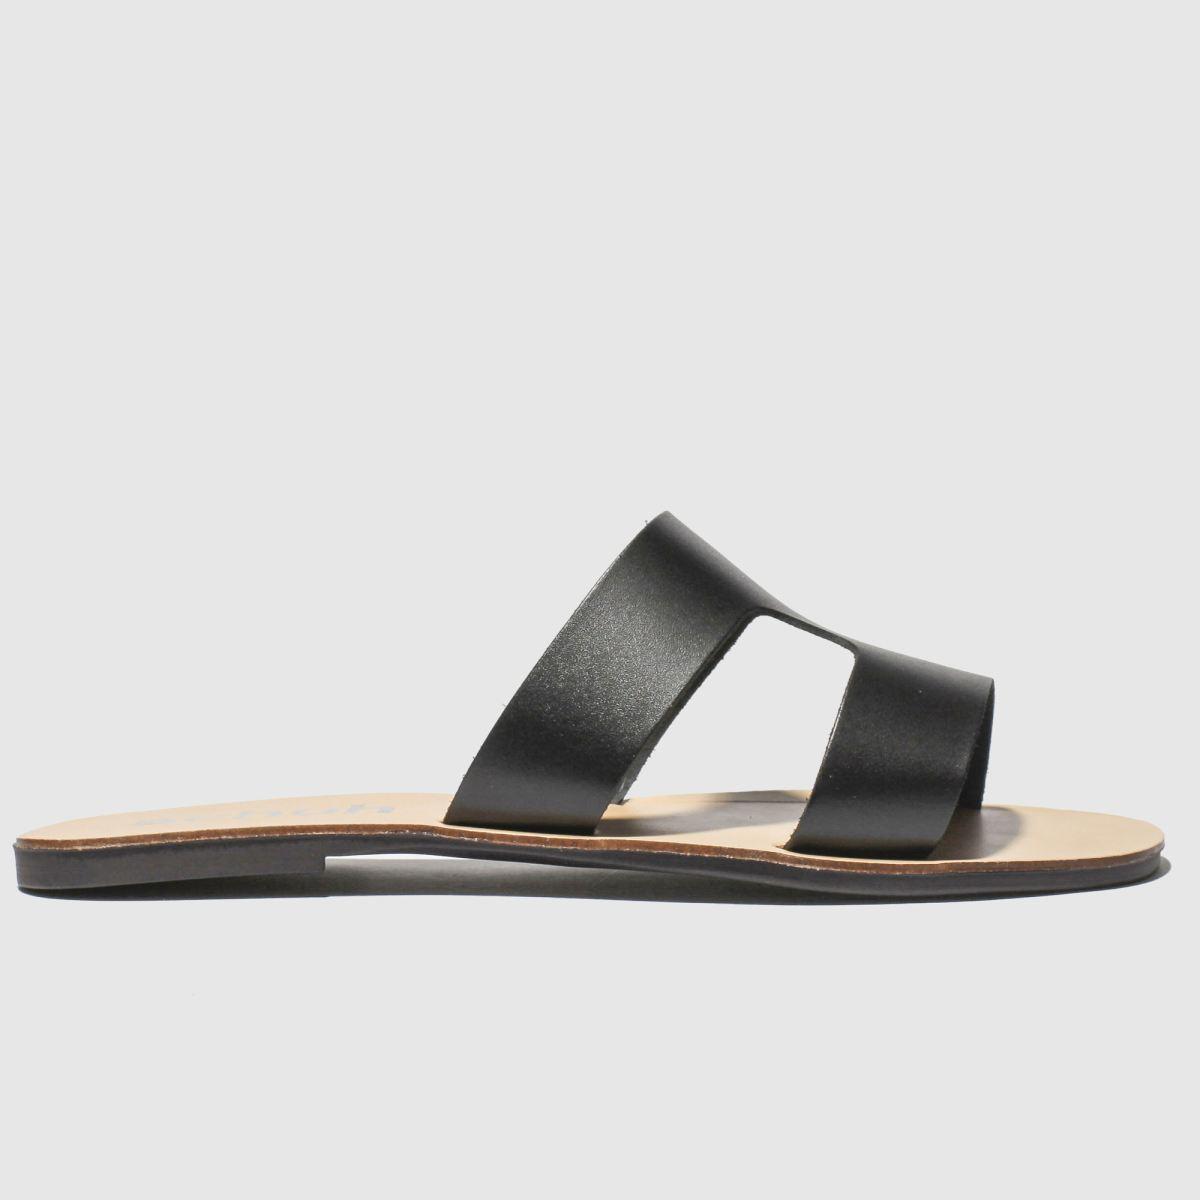 schuh Schuh Black Mallorca Sandals